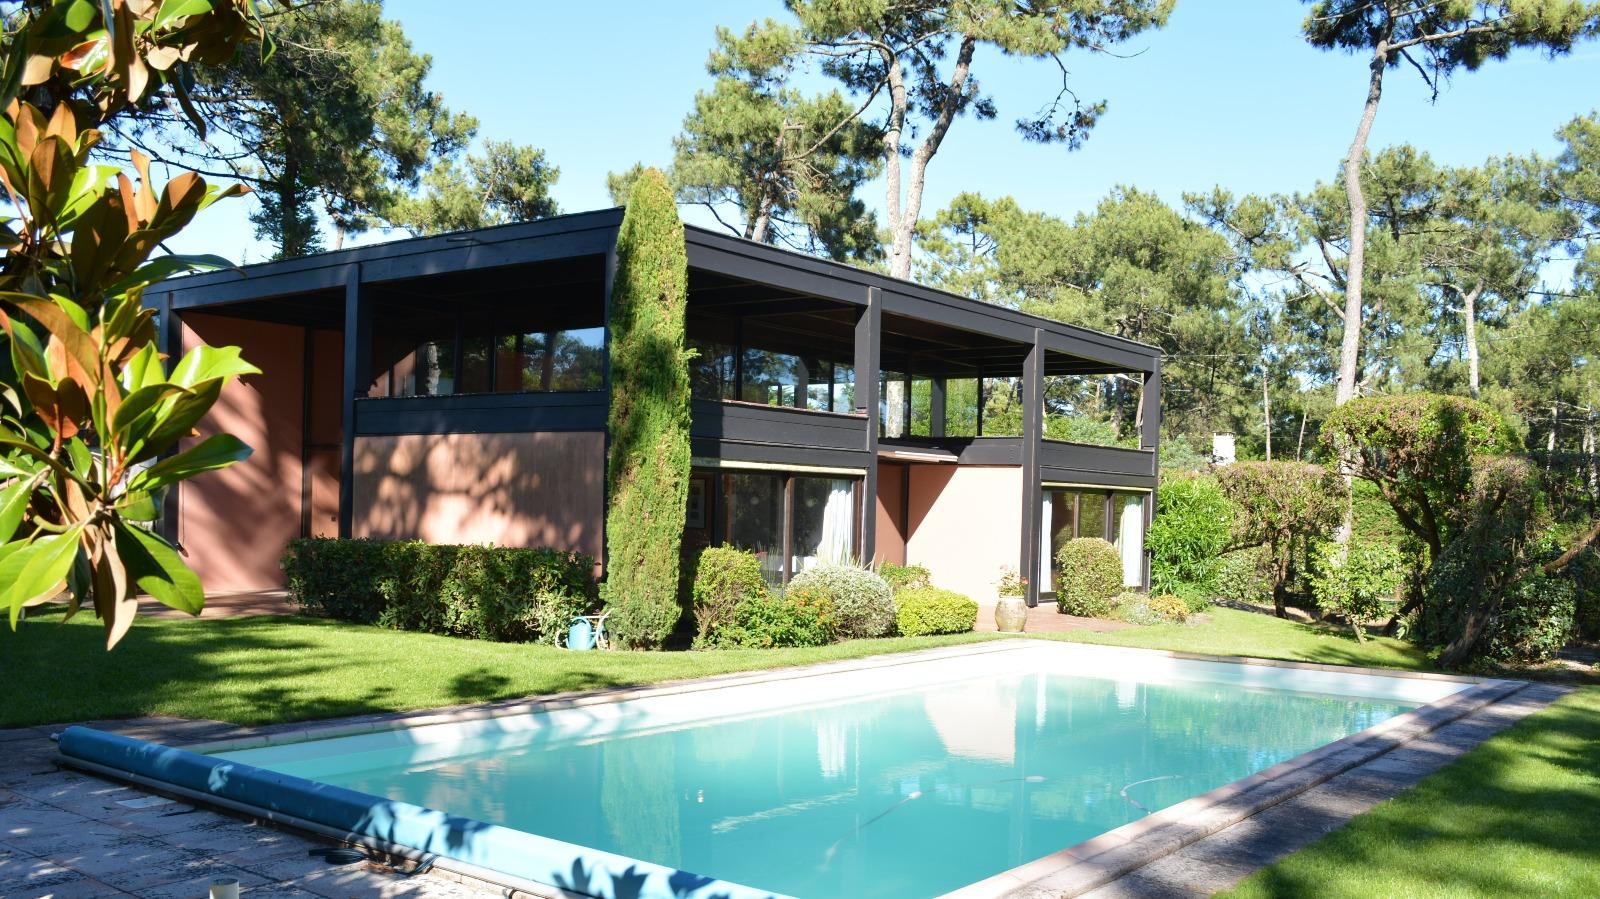 Cap ferret maison avec piscine proche bassin immo prestige for Maison a louer cap ferret avec piscine